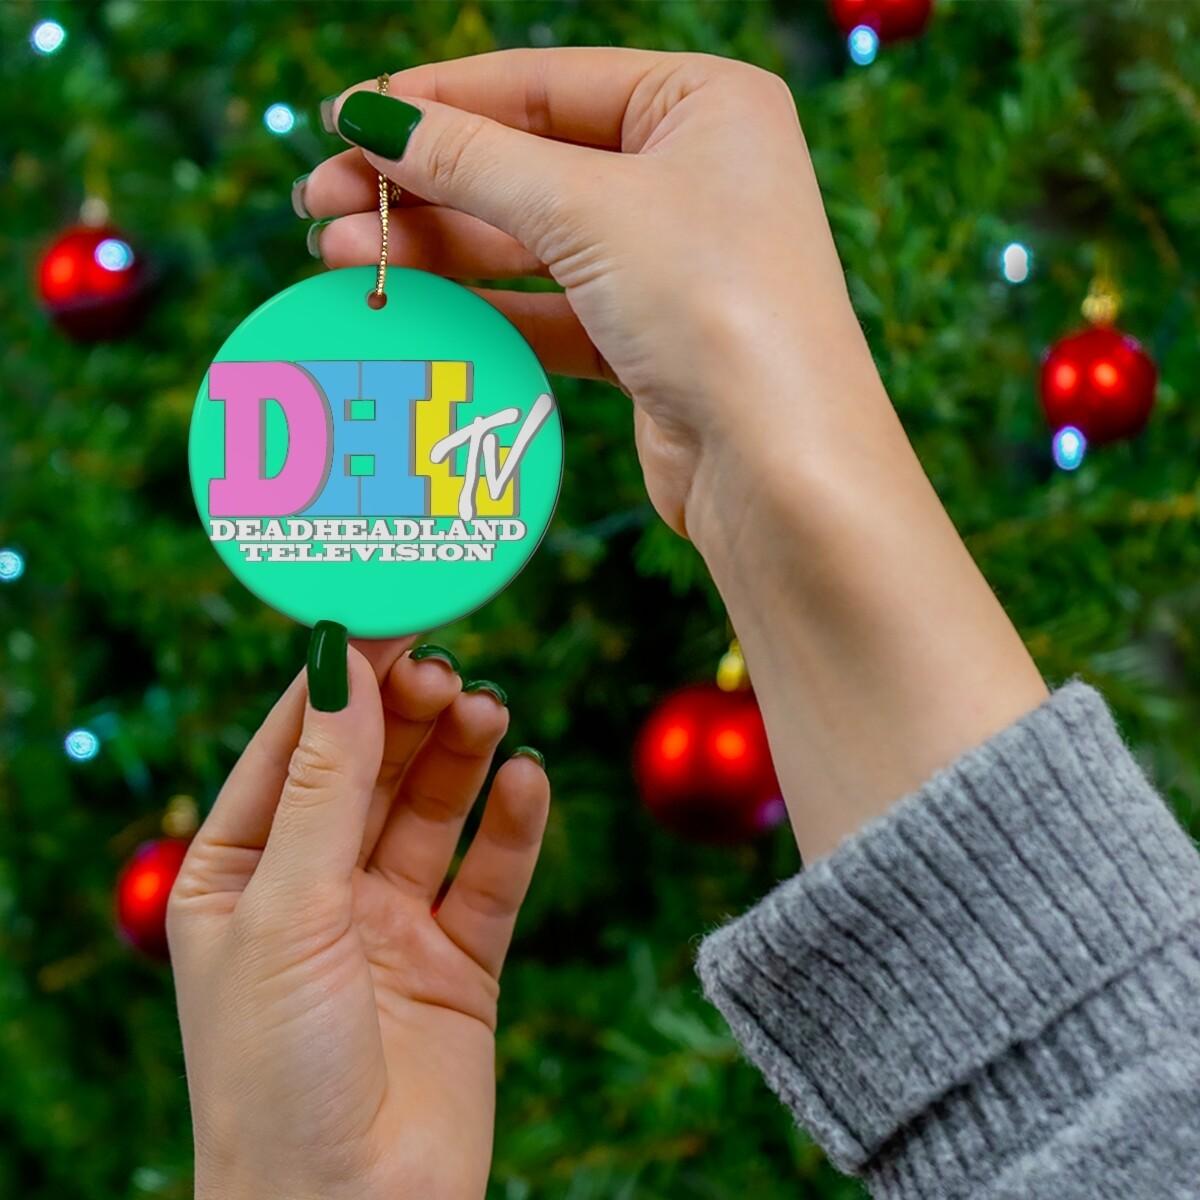 2021 Deadheadland Ornaments #4 -  DHLTV